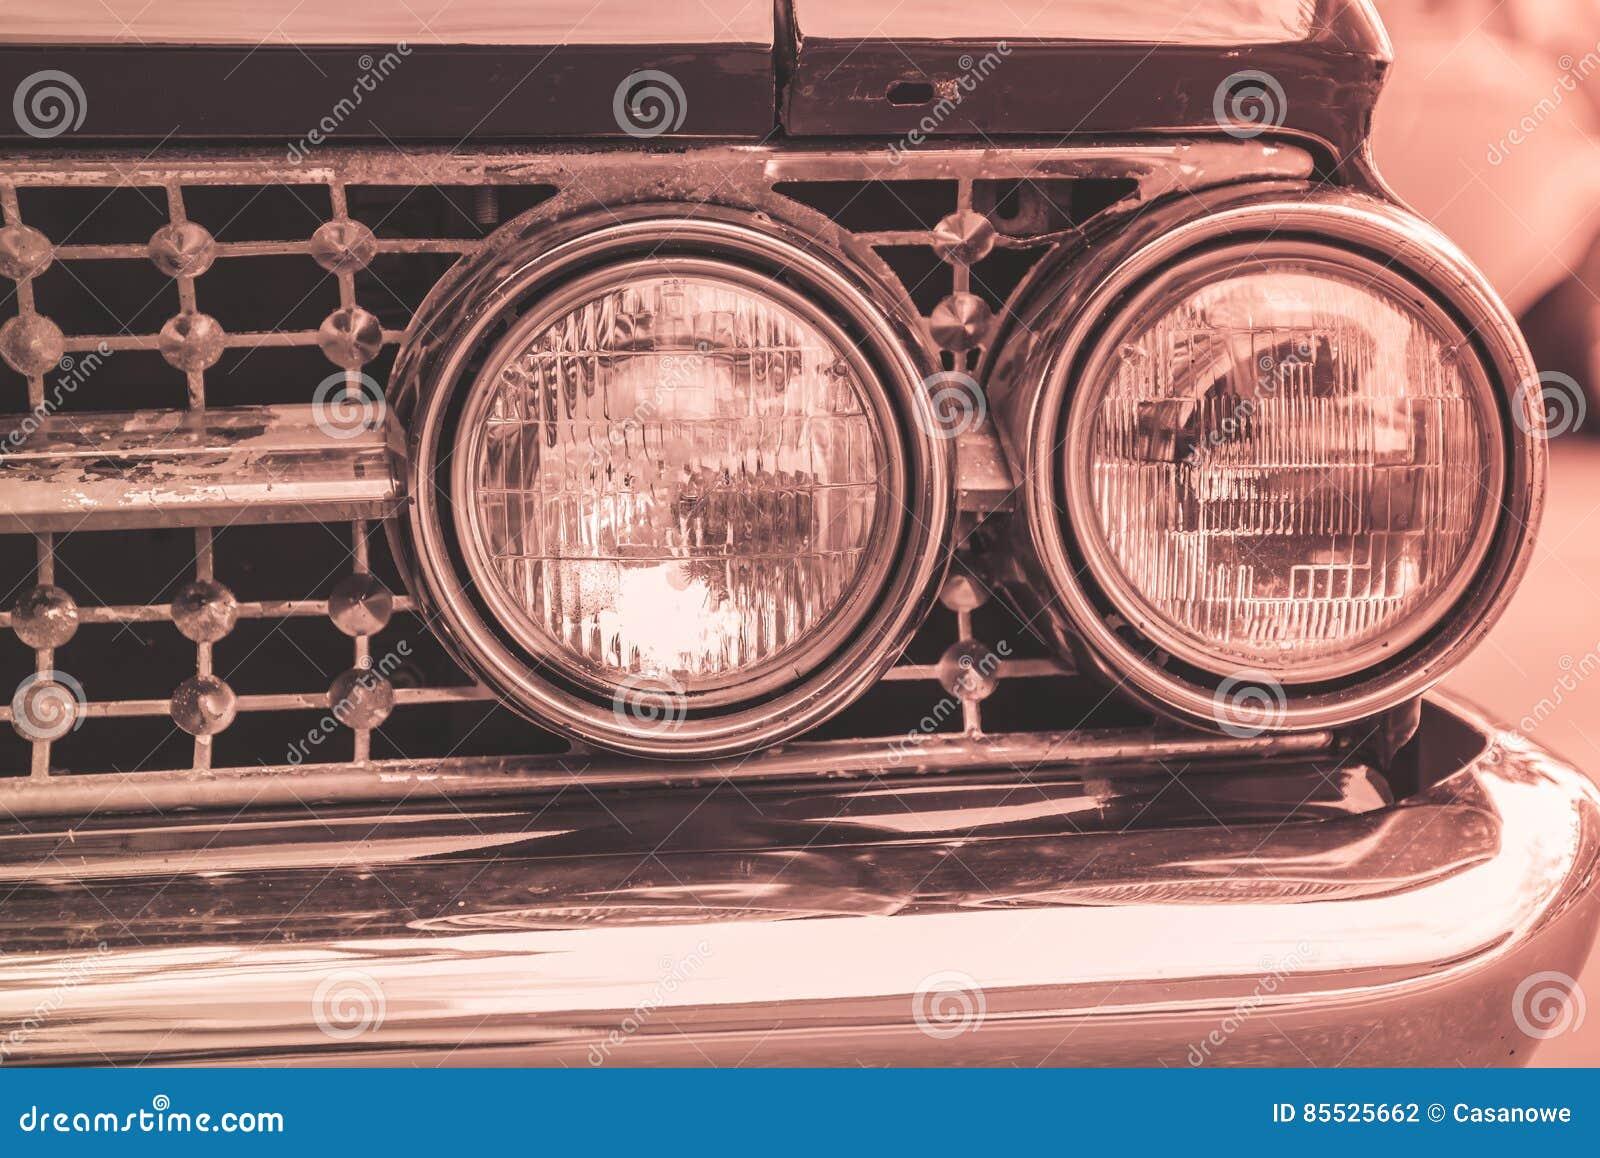 Vintage Auto Headlight Styles : Headlight lamp of retro classic car vintage style stock